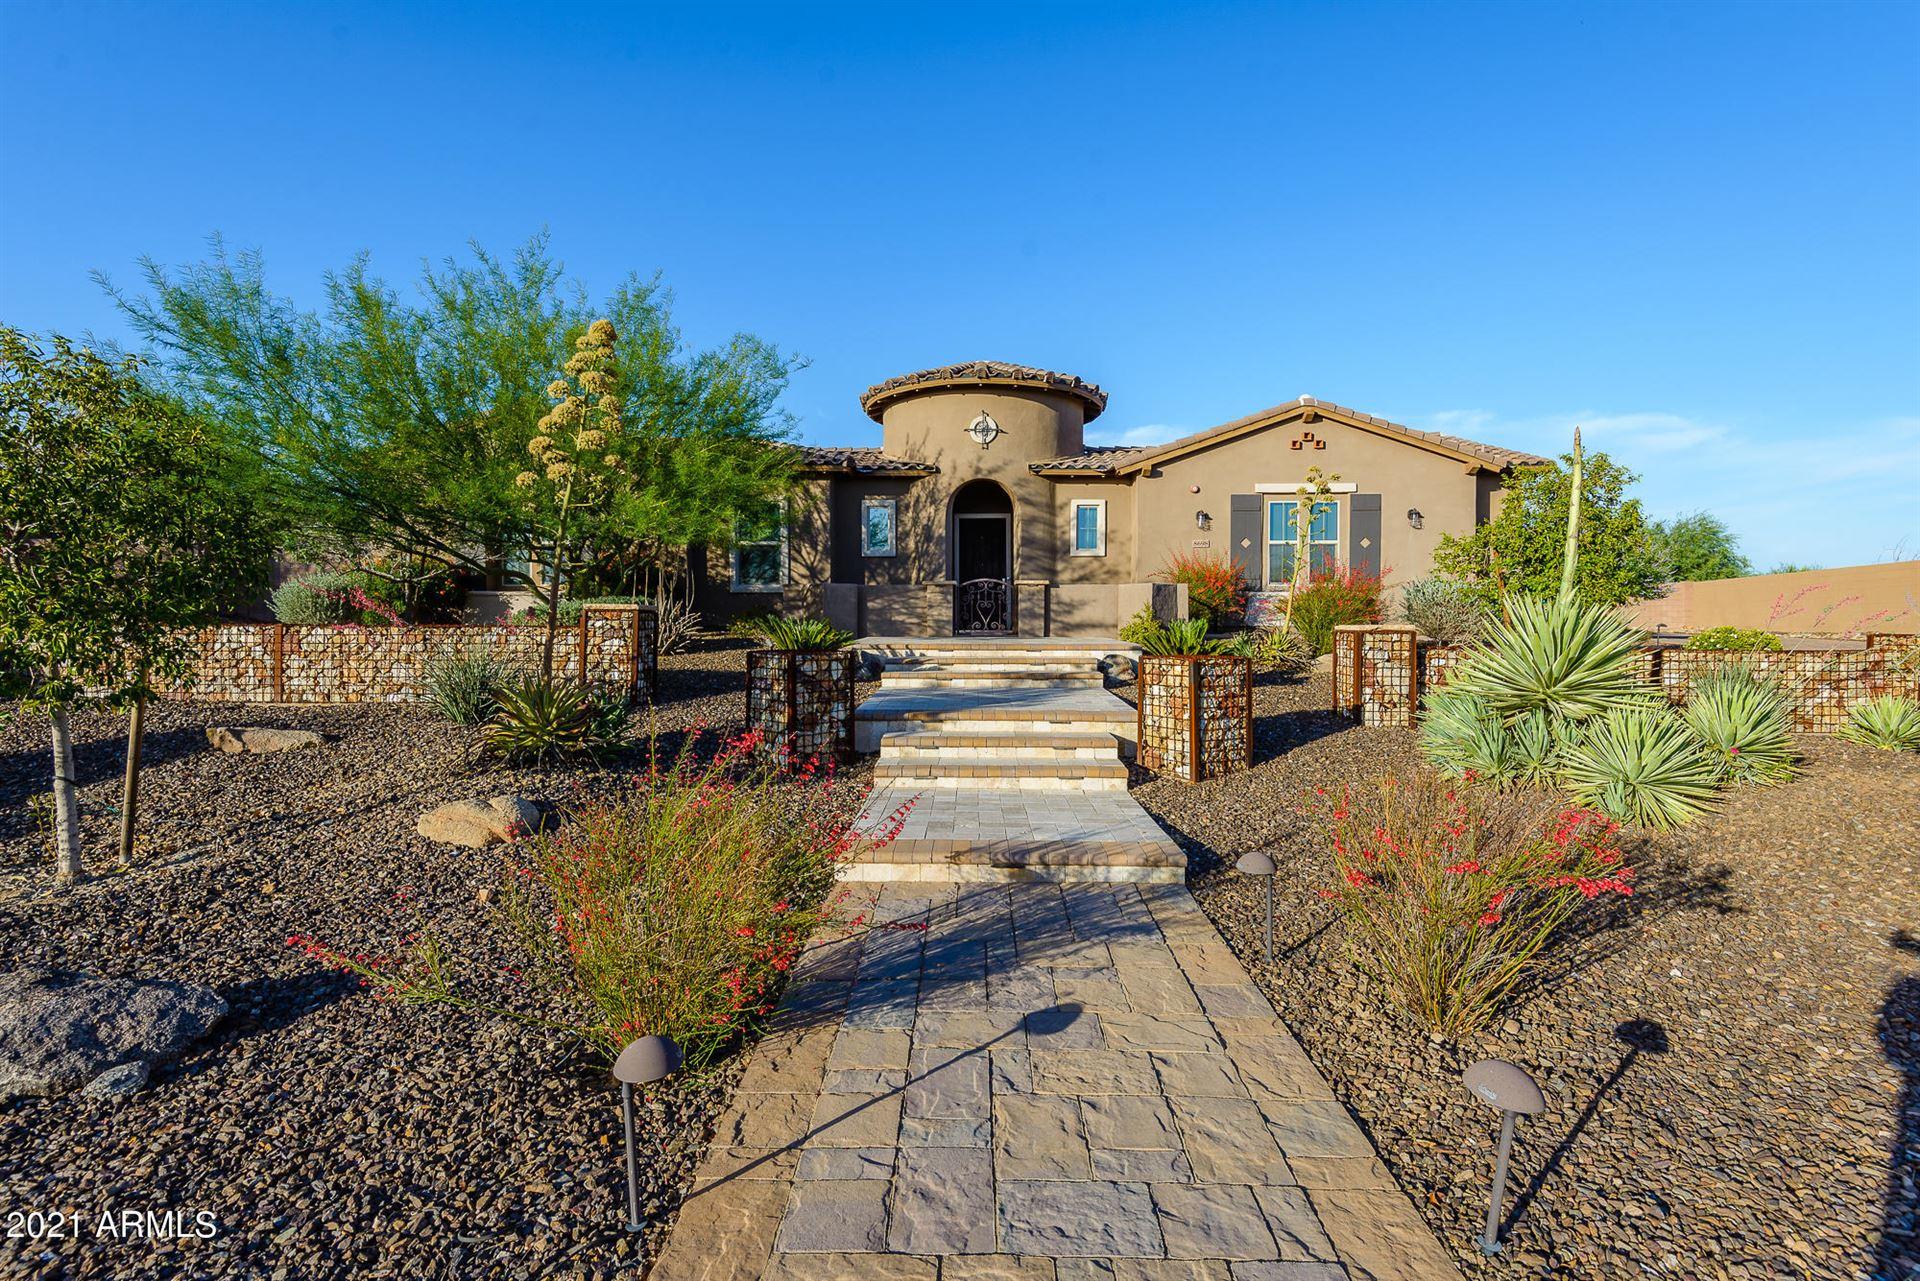 Photo of 8698 W VILLA LINDO Drive, Peoria, AZ 85383 (MLS # 6232368)